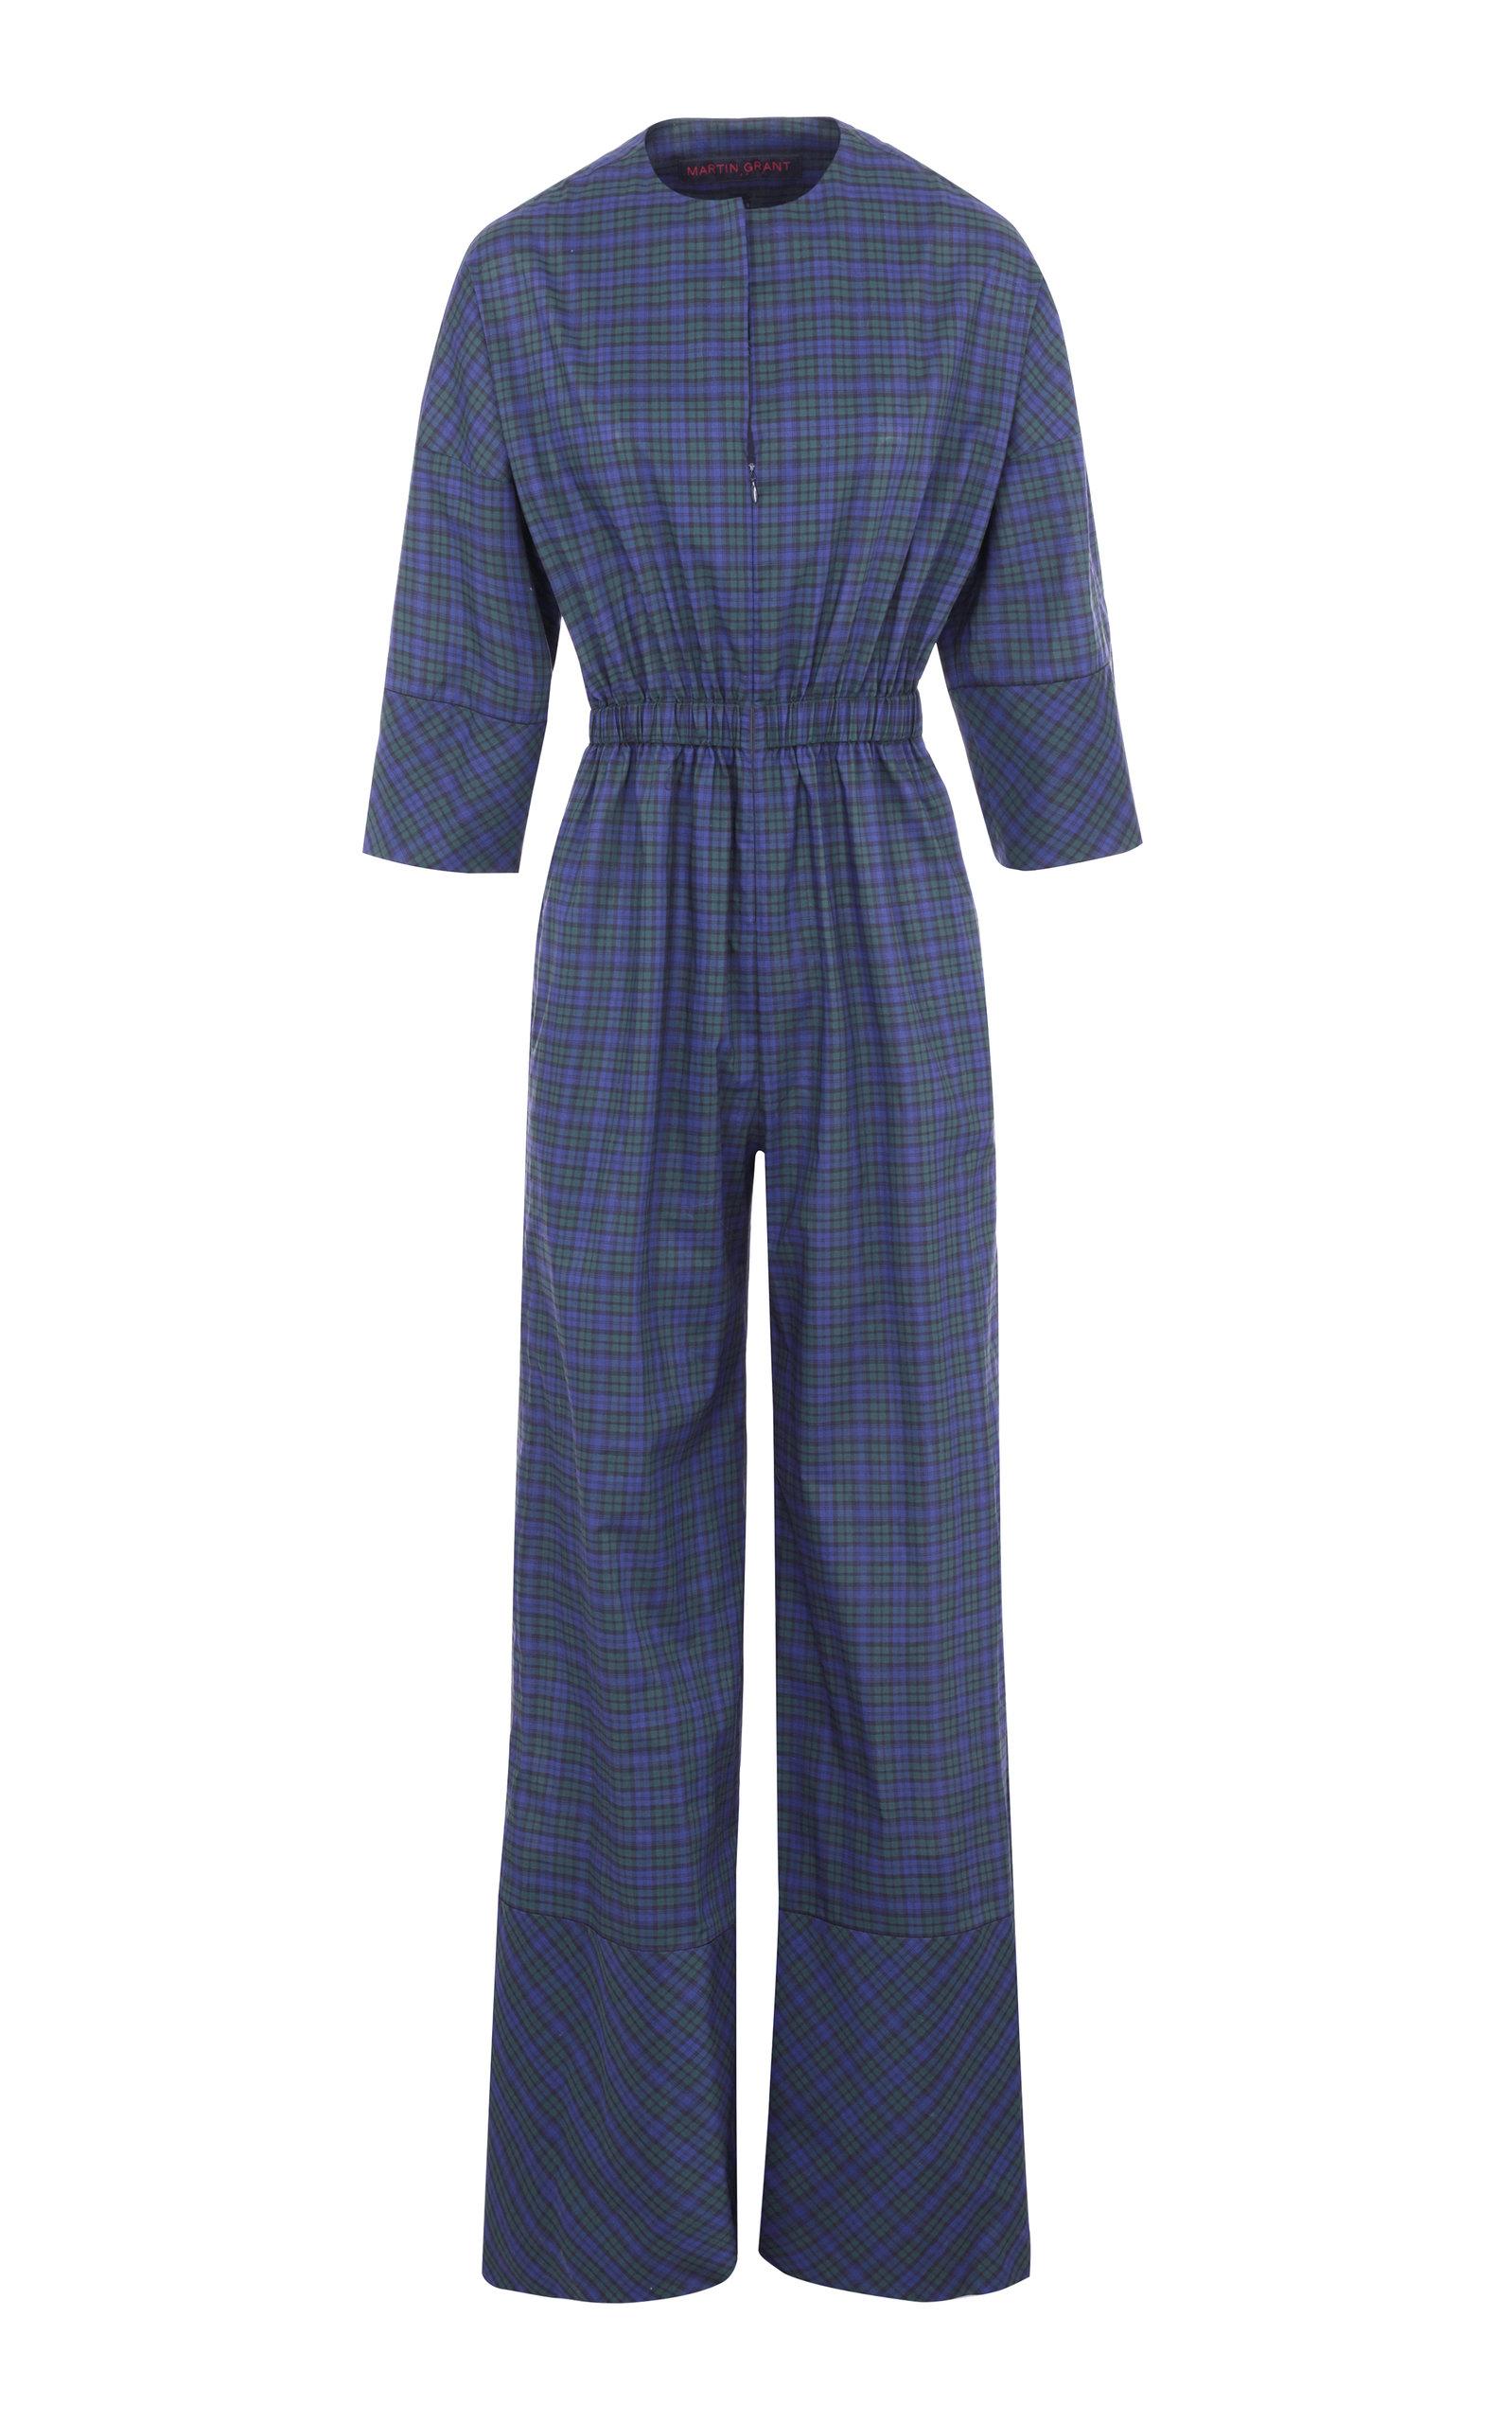 Women's Checked Cotton-Poplin Jumpsuit